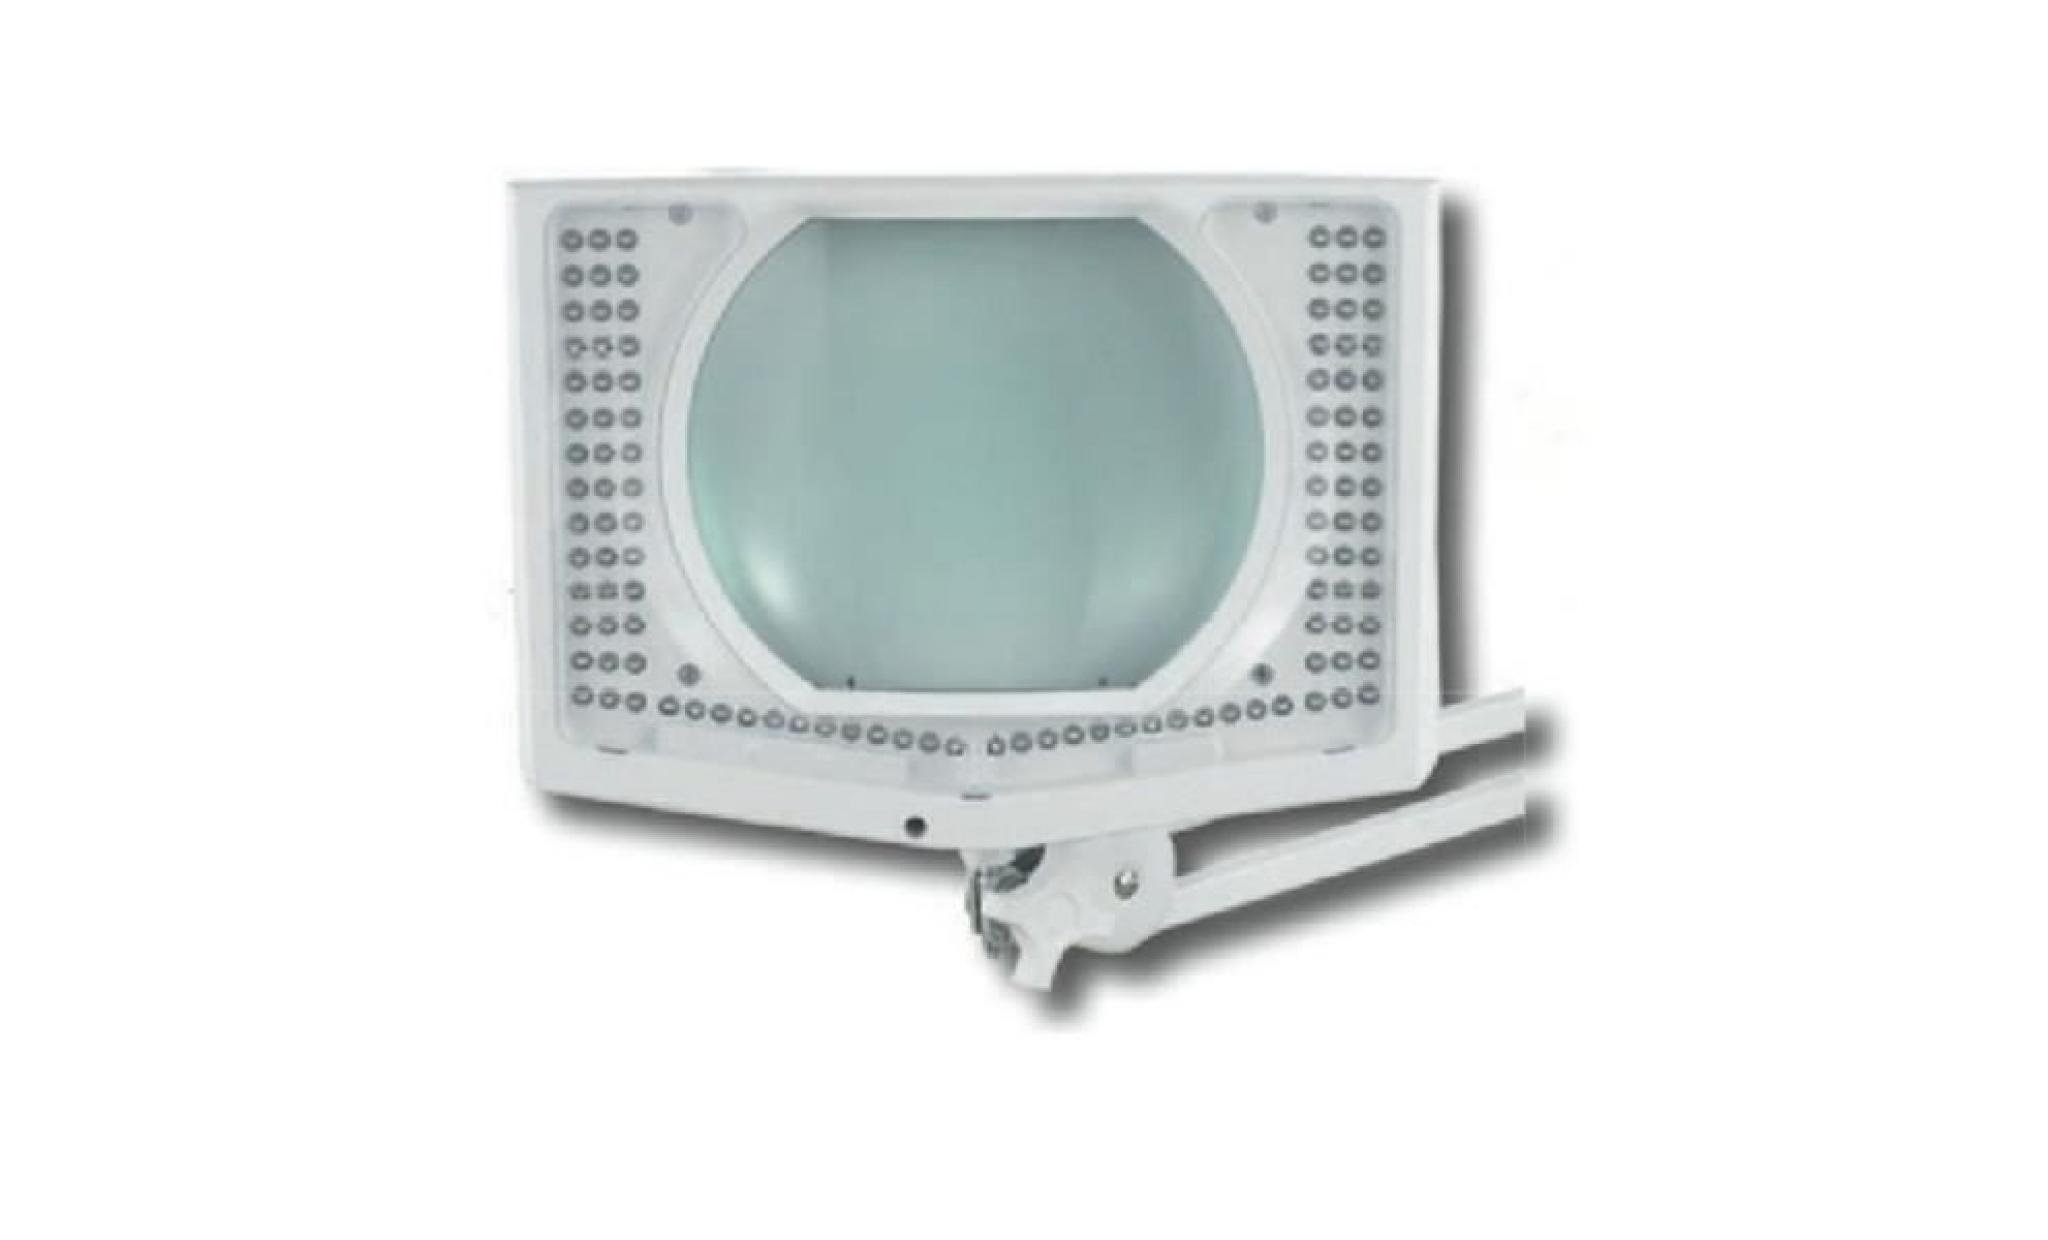 Lux177ec Electris Étau Led 108 Rectangulaire Leds Loupe Lampe 345larj 2HDE9I